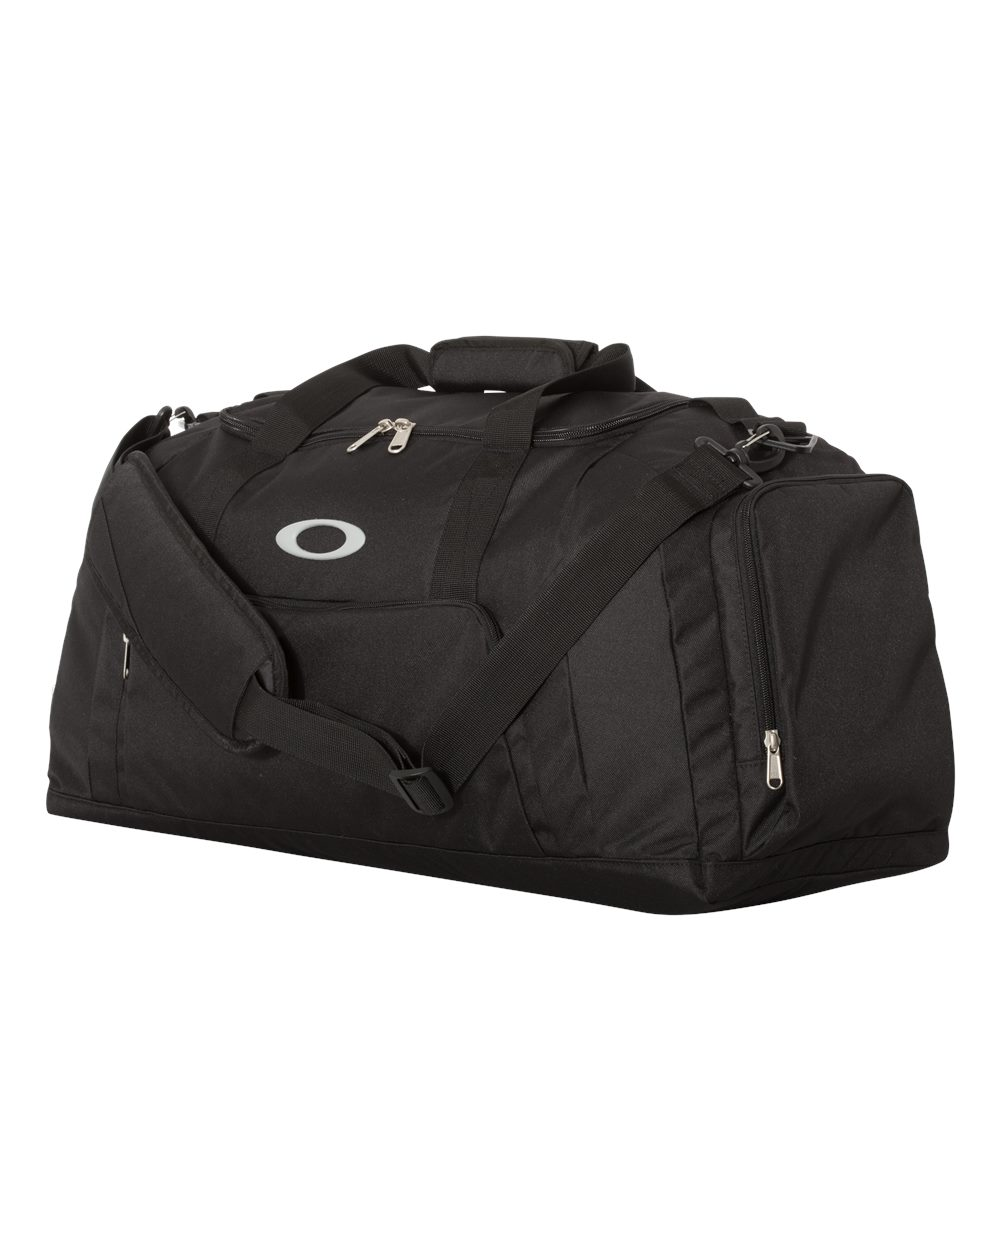 Oakley 92904ODM - 55L Gym to Street Duffel Bag